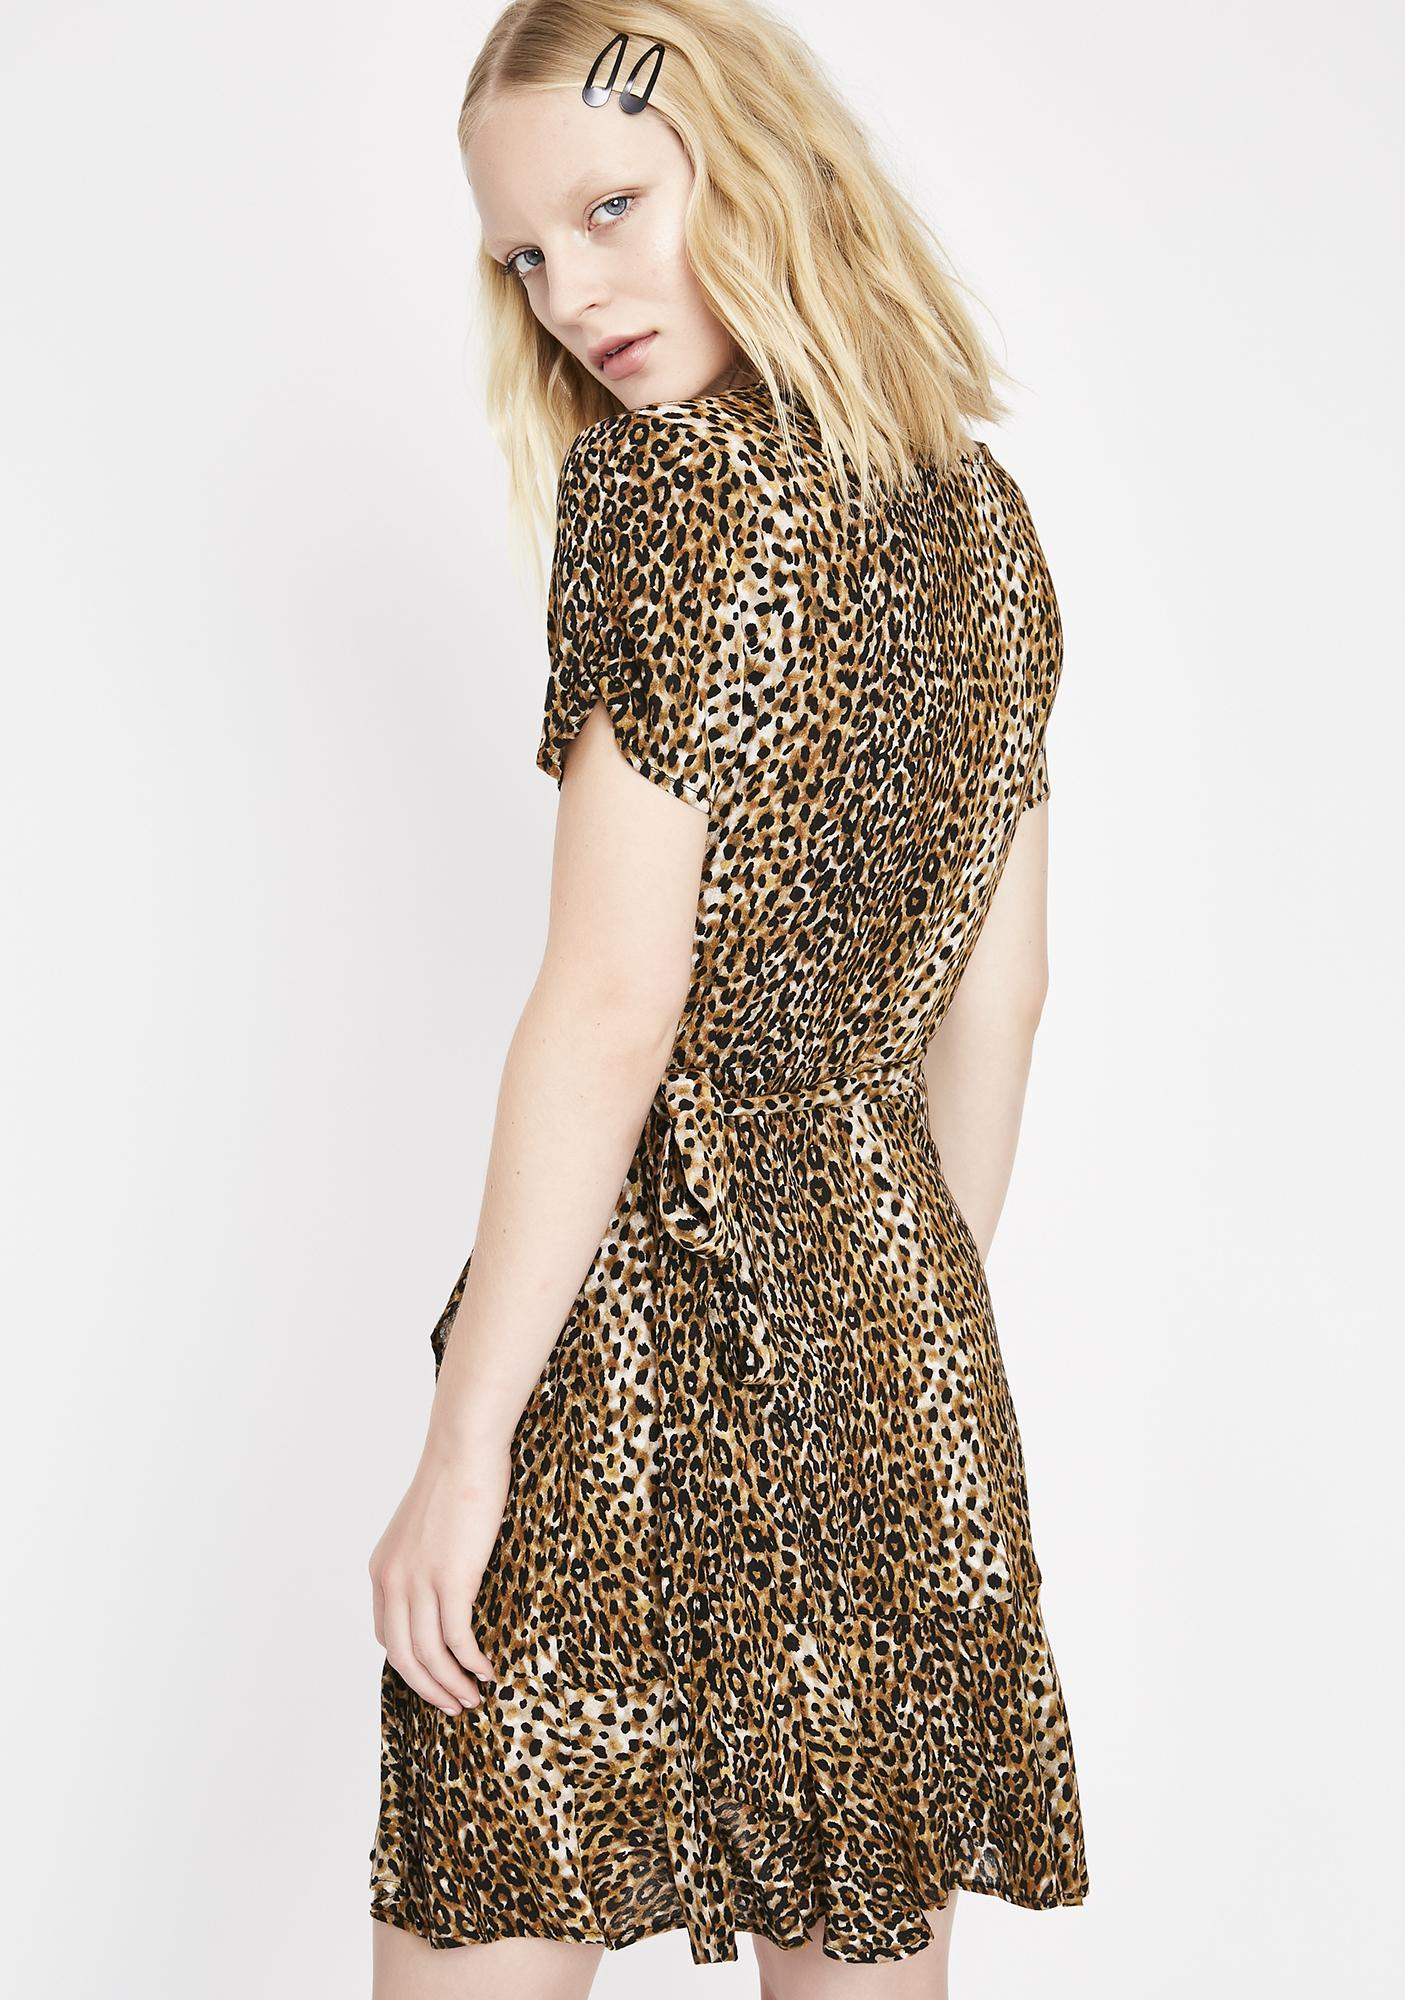 Kitty Danger Wrap Dress